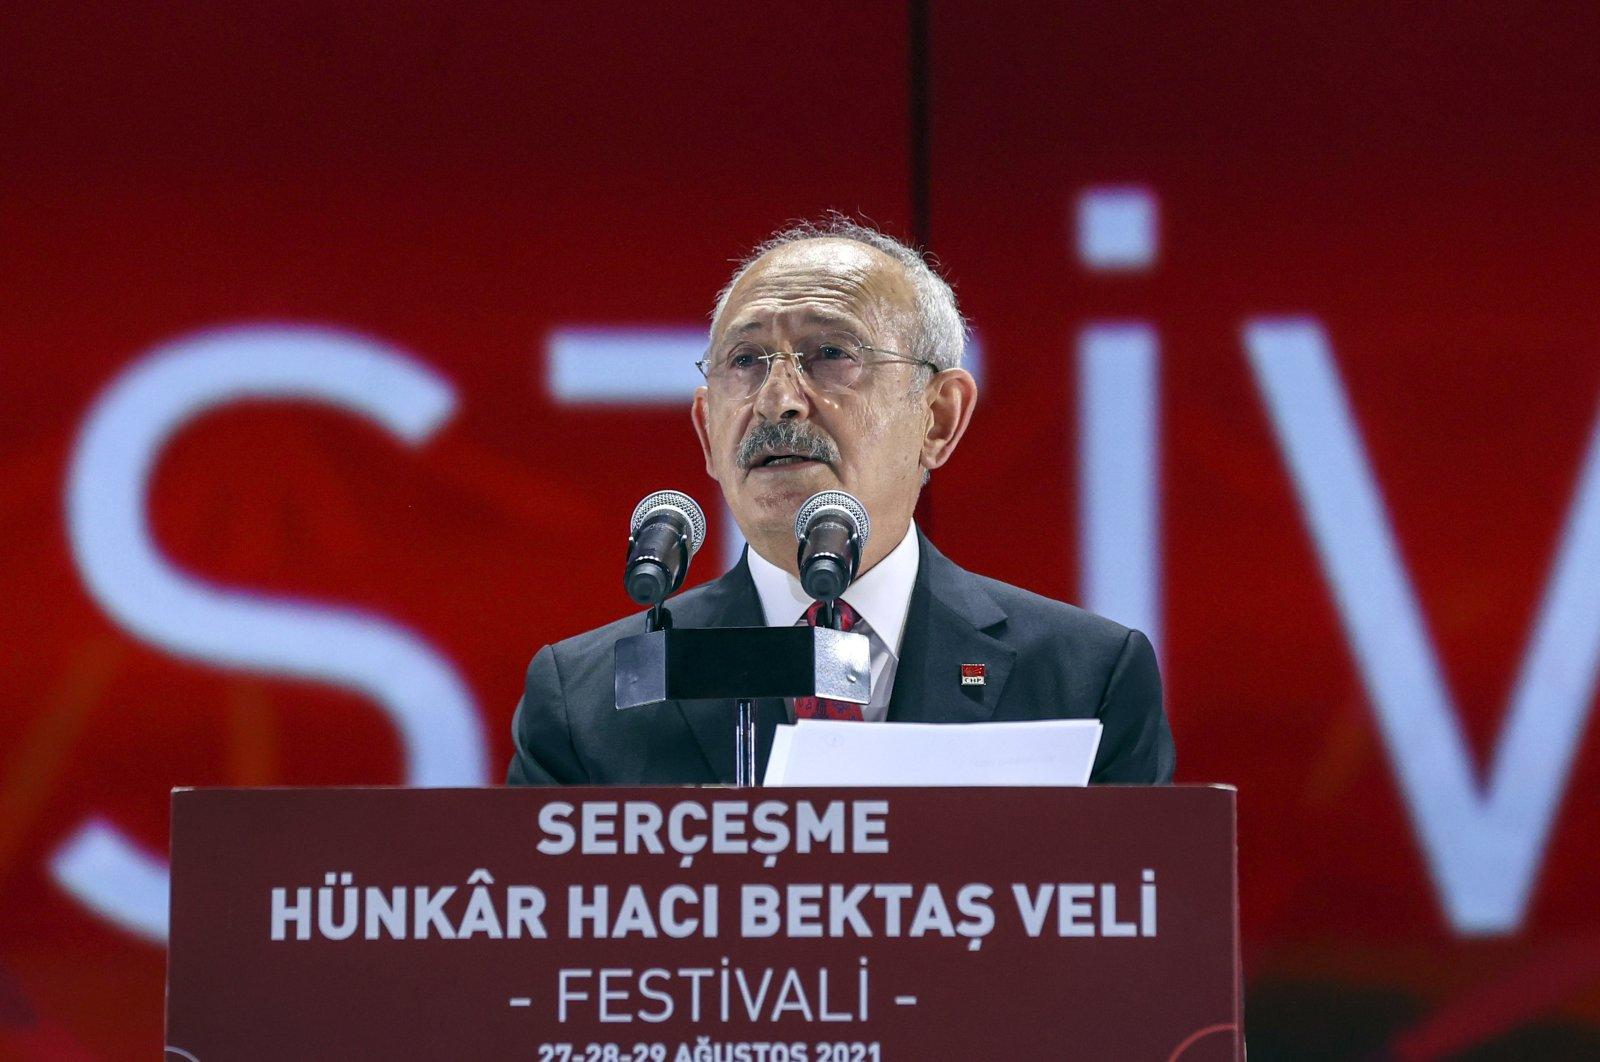 The main opposition Republican People's Party (CHP) Chair Kemal Kılıçdaroğlu speaks at an event in Istanbul, Turkey, Aug. 28, 2021. (AA Photo)